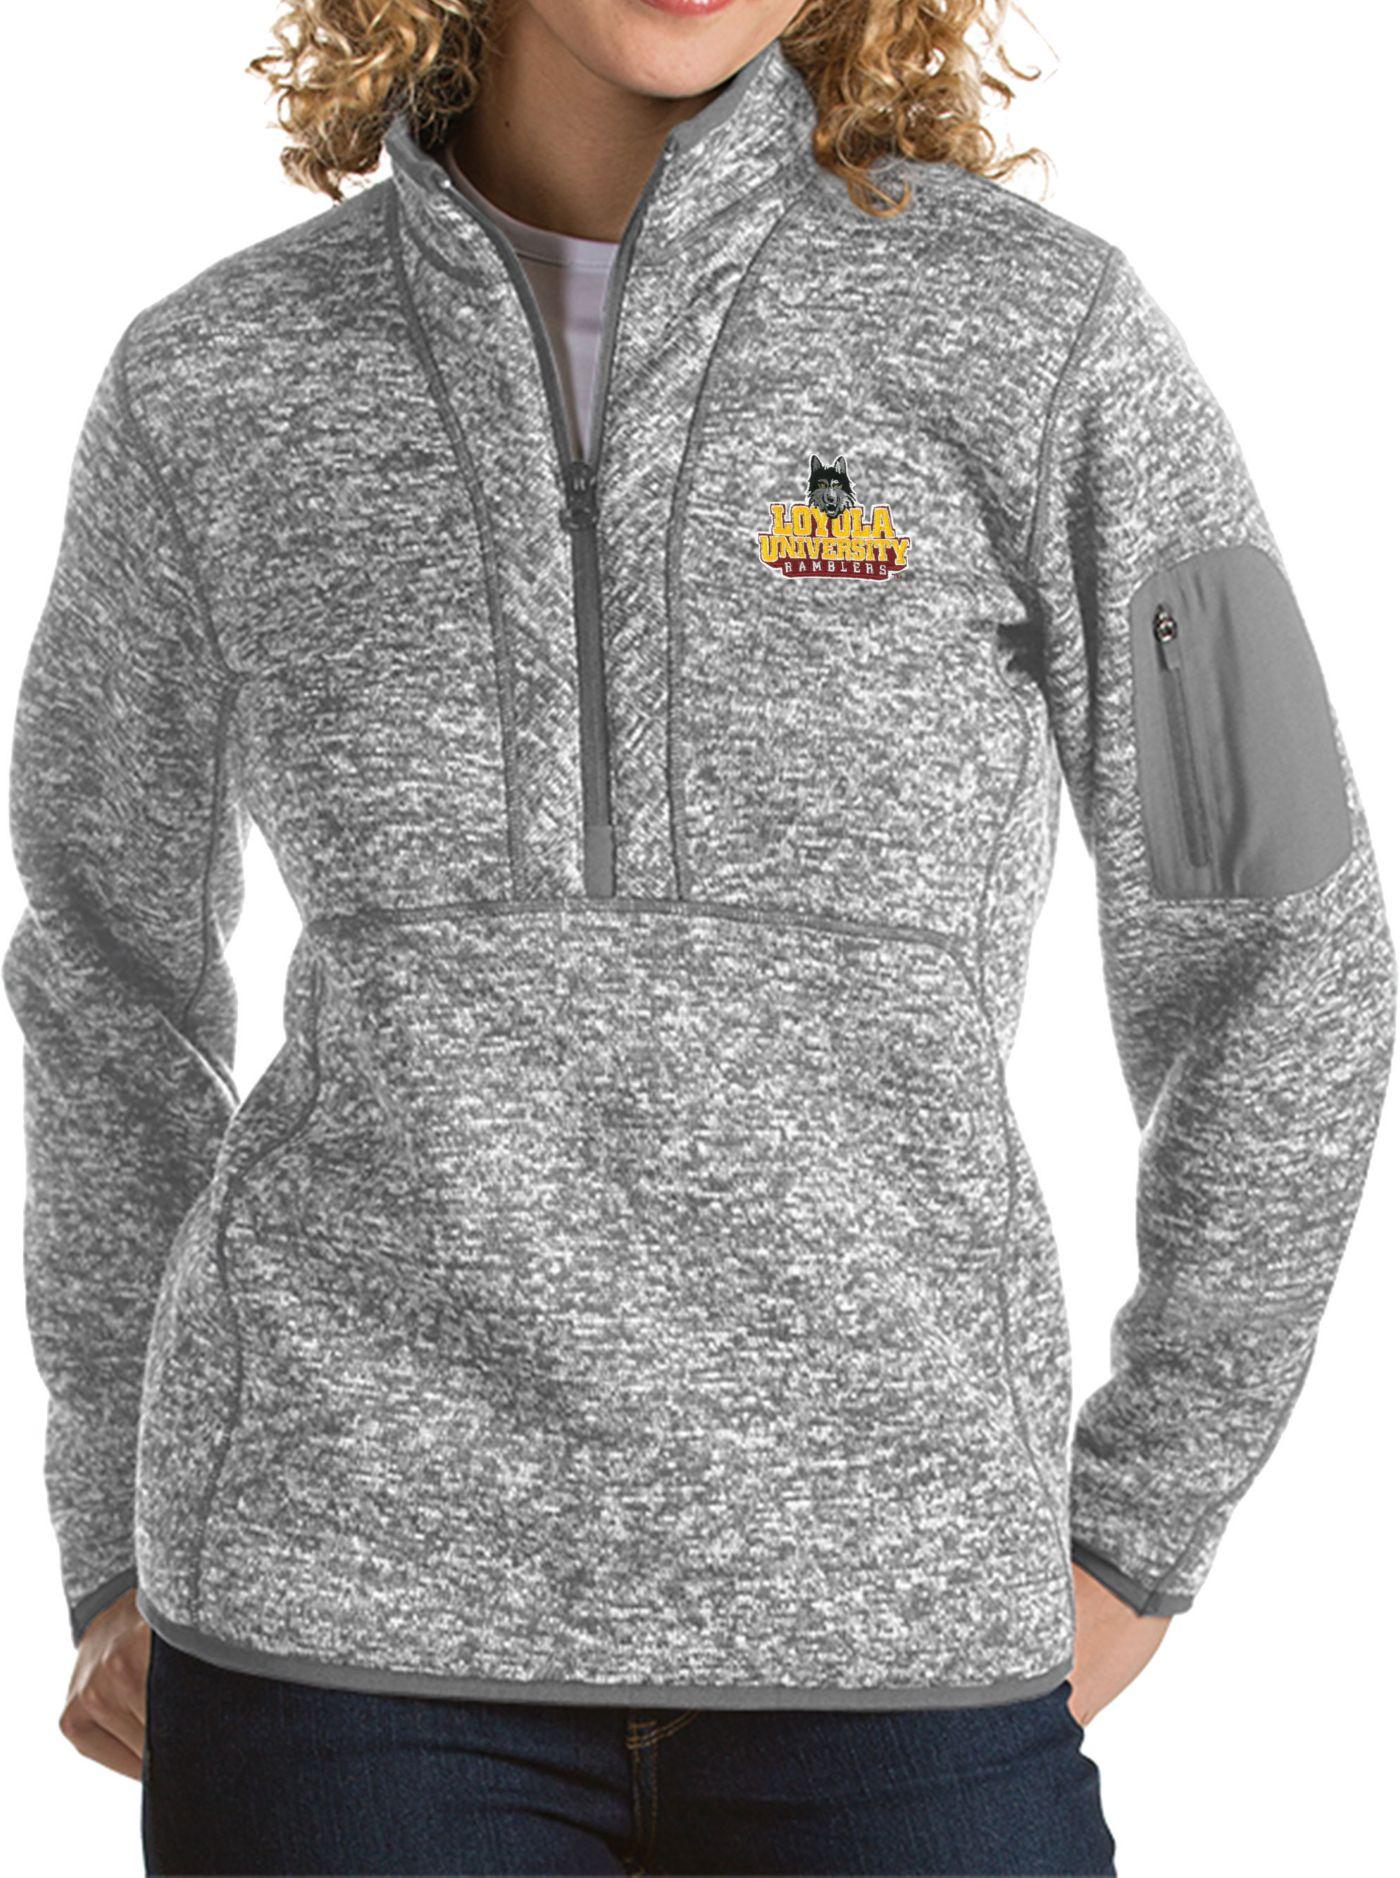 Antigua Women's Loyola Chicago Ramblers Grey Fortune Pullover Jacket